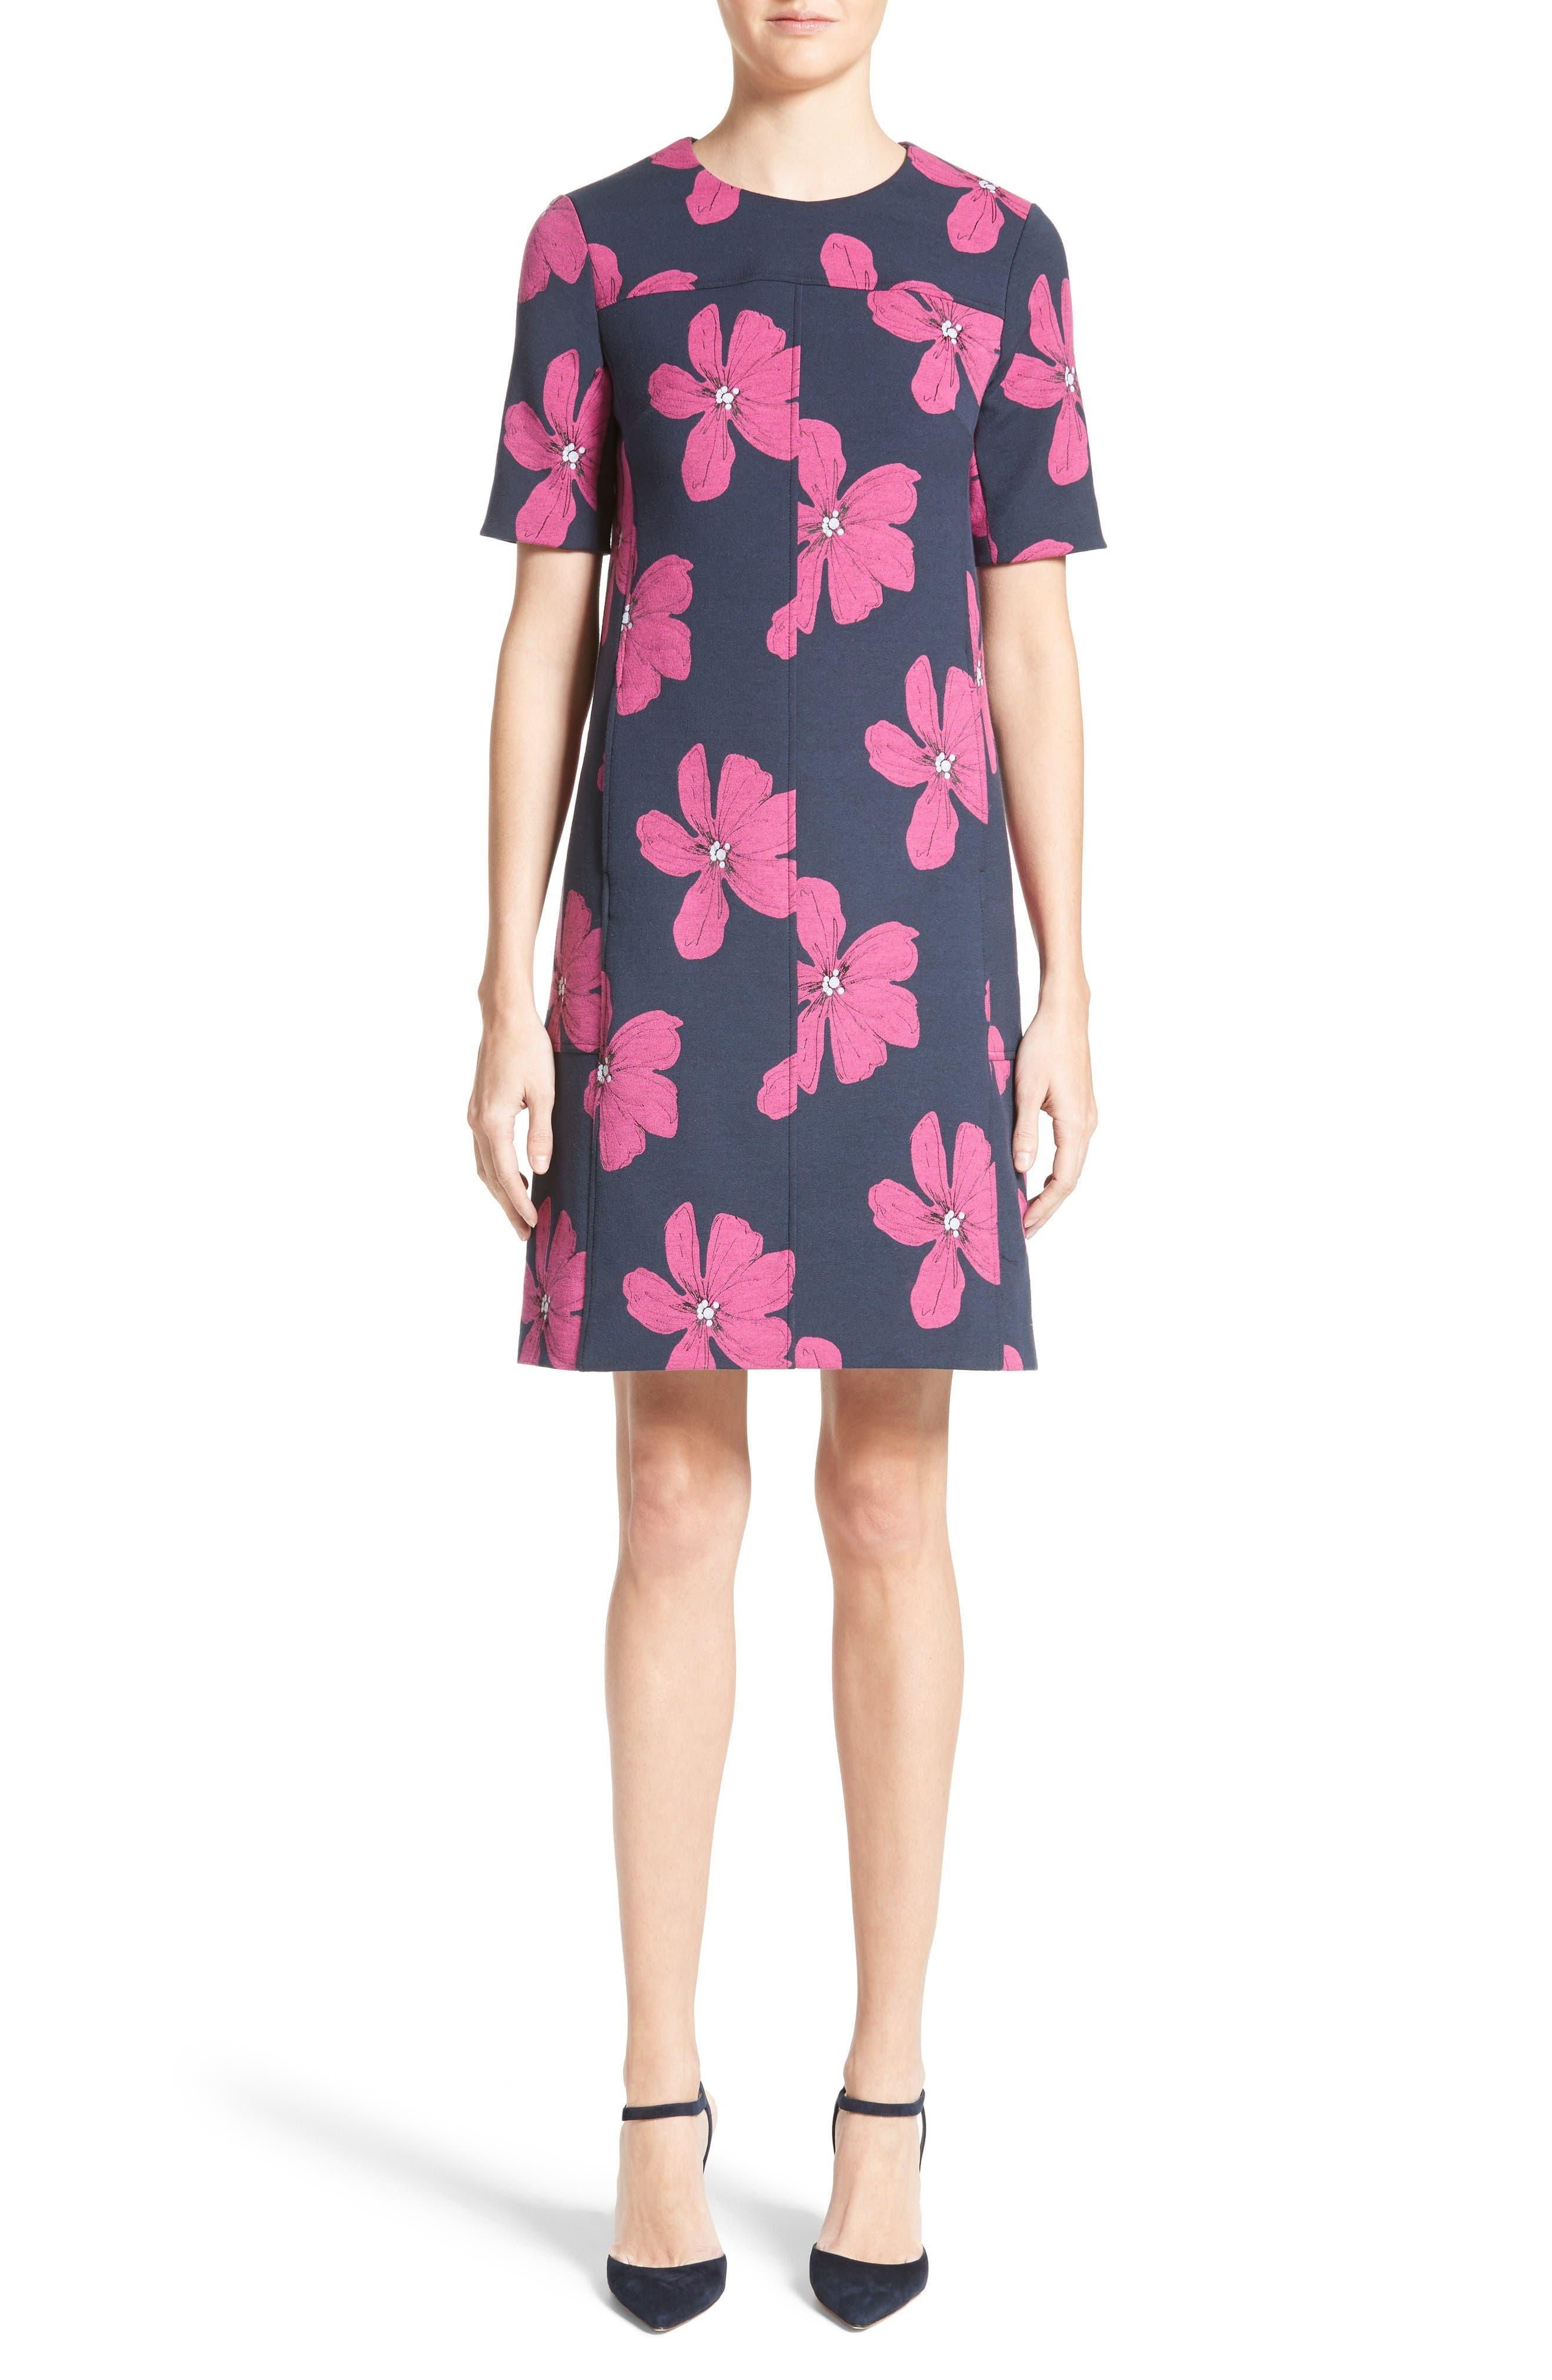 Floral Print Stretch Jacquard Tunic Dress,                             Main thumbnail 1, color,                             Navy/ Fuchsia